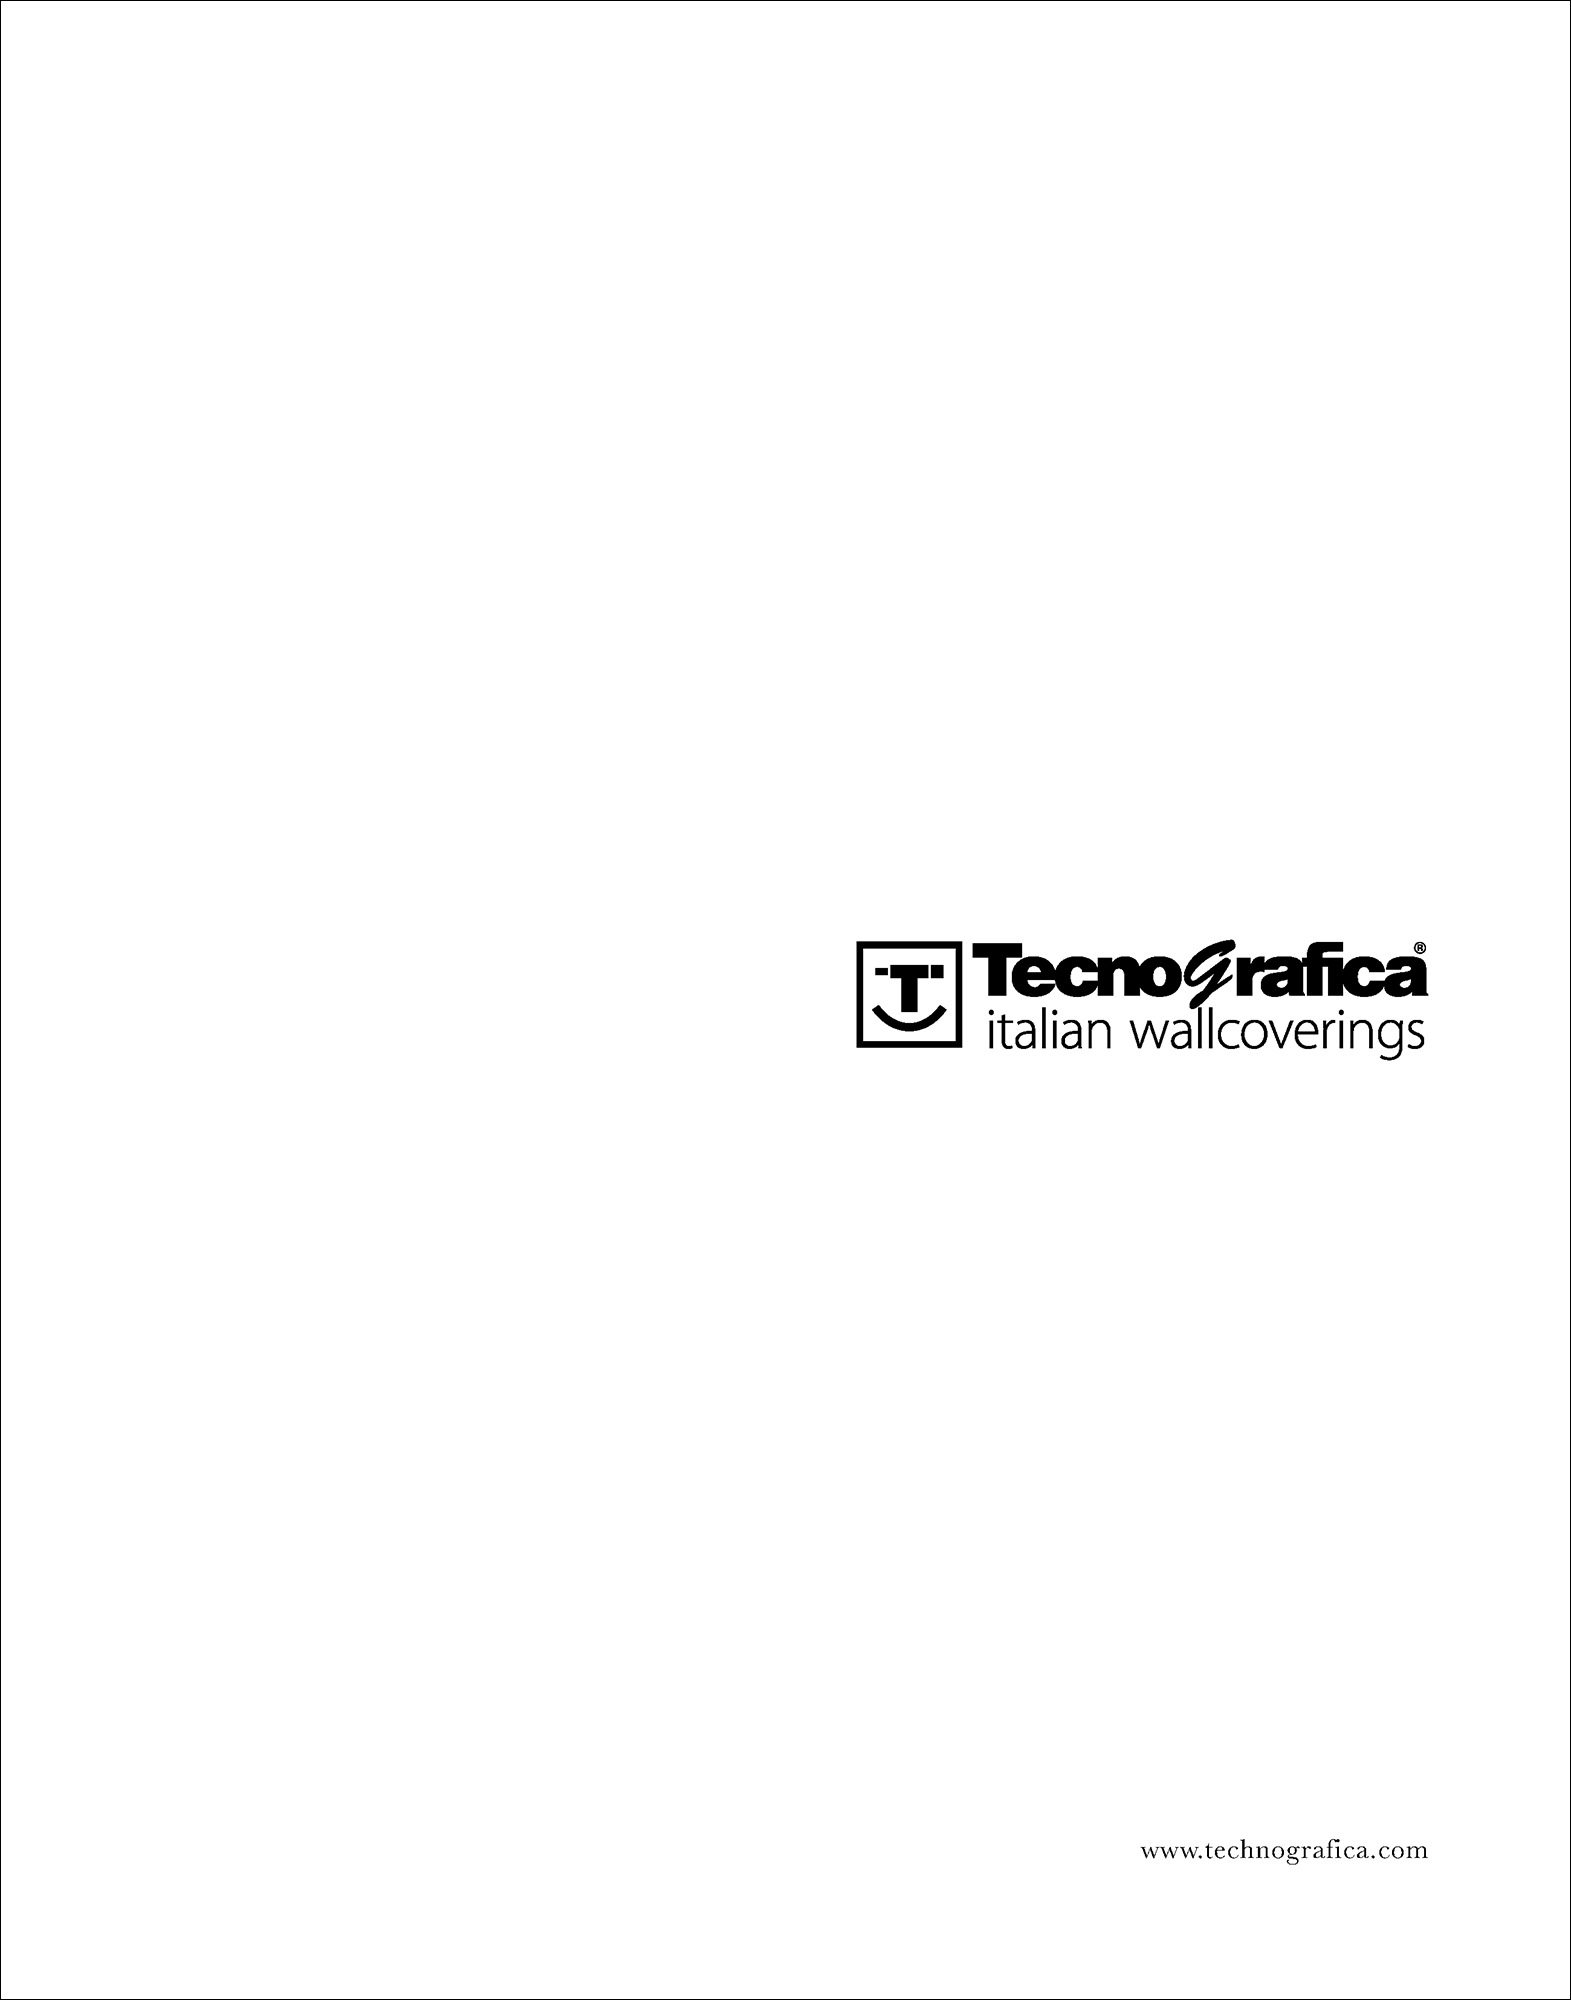 print adv hipix catalogo tecnografica immagine 2